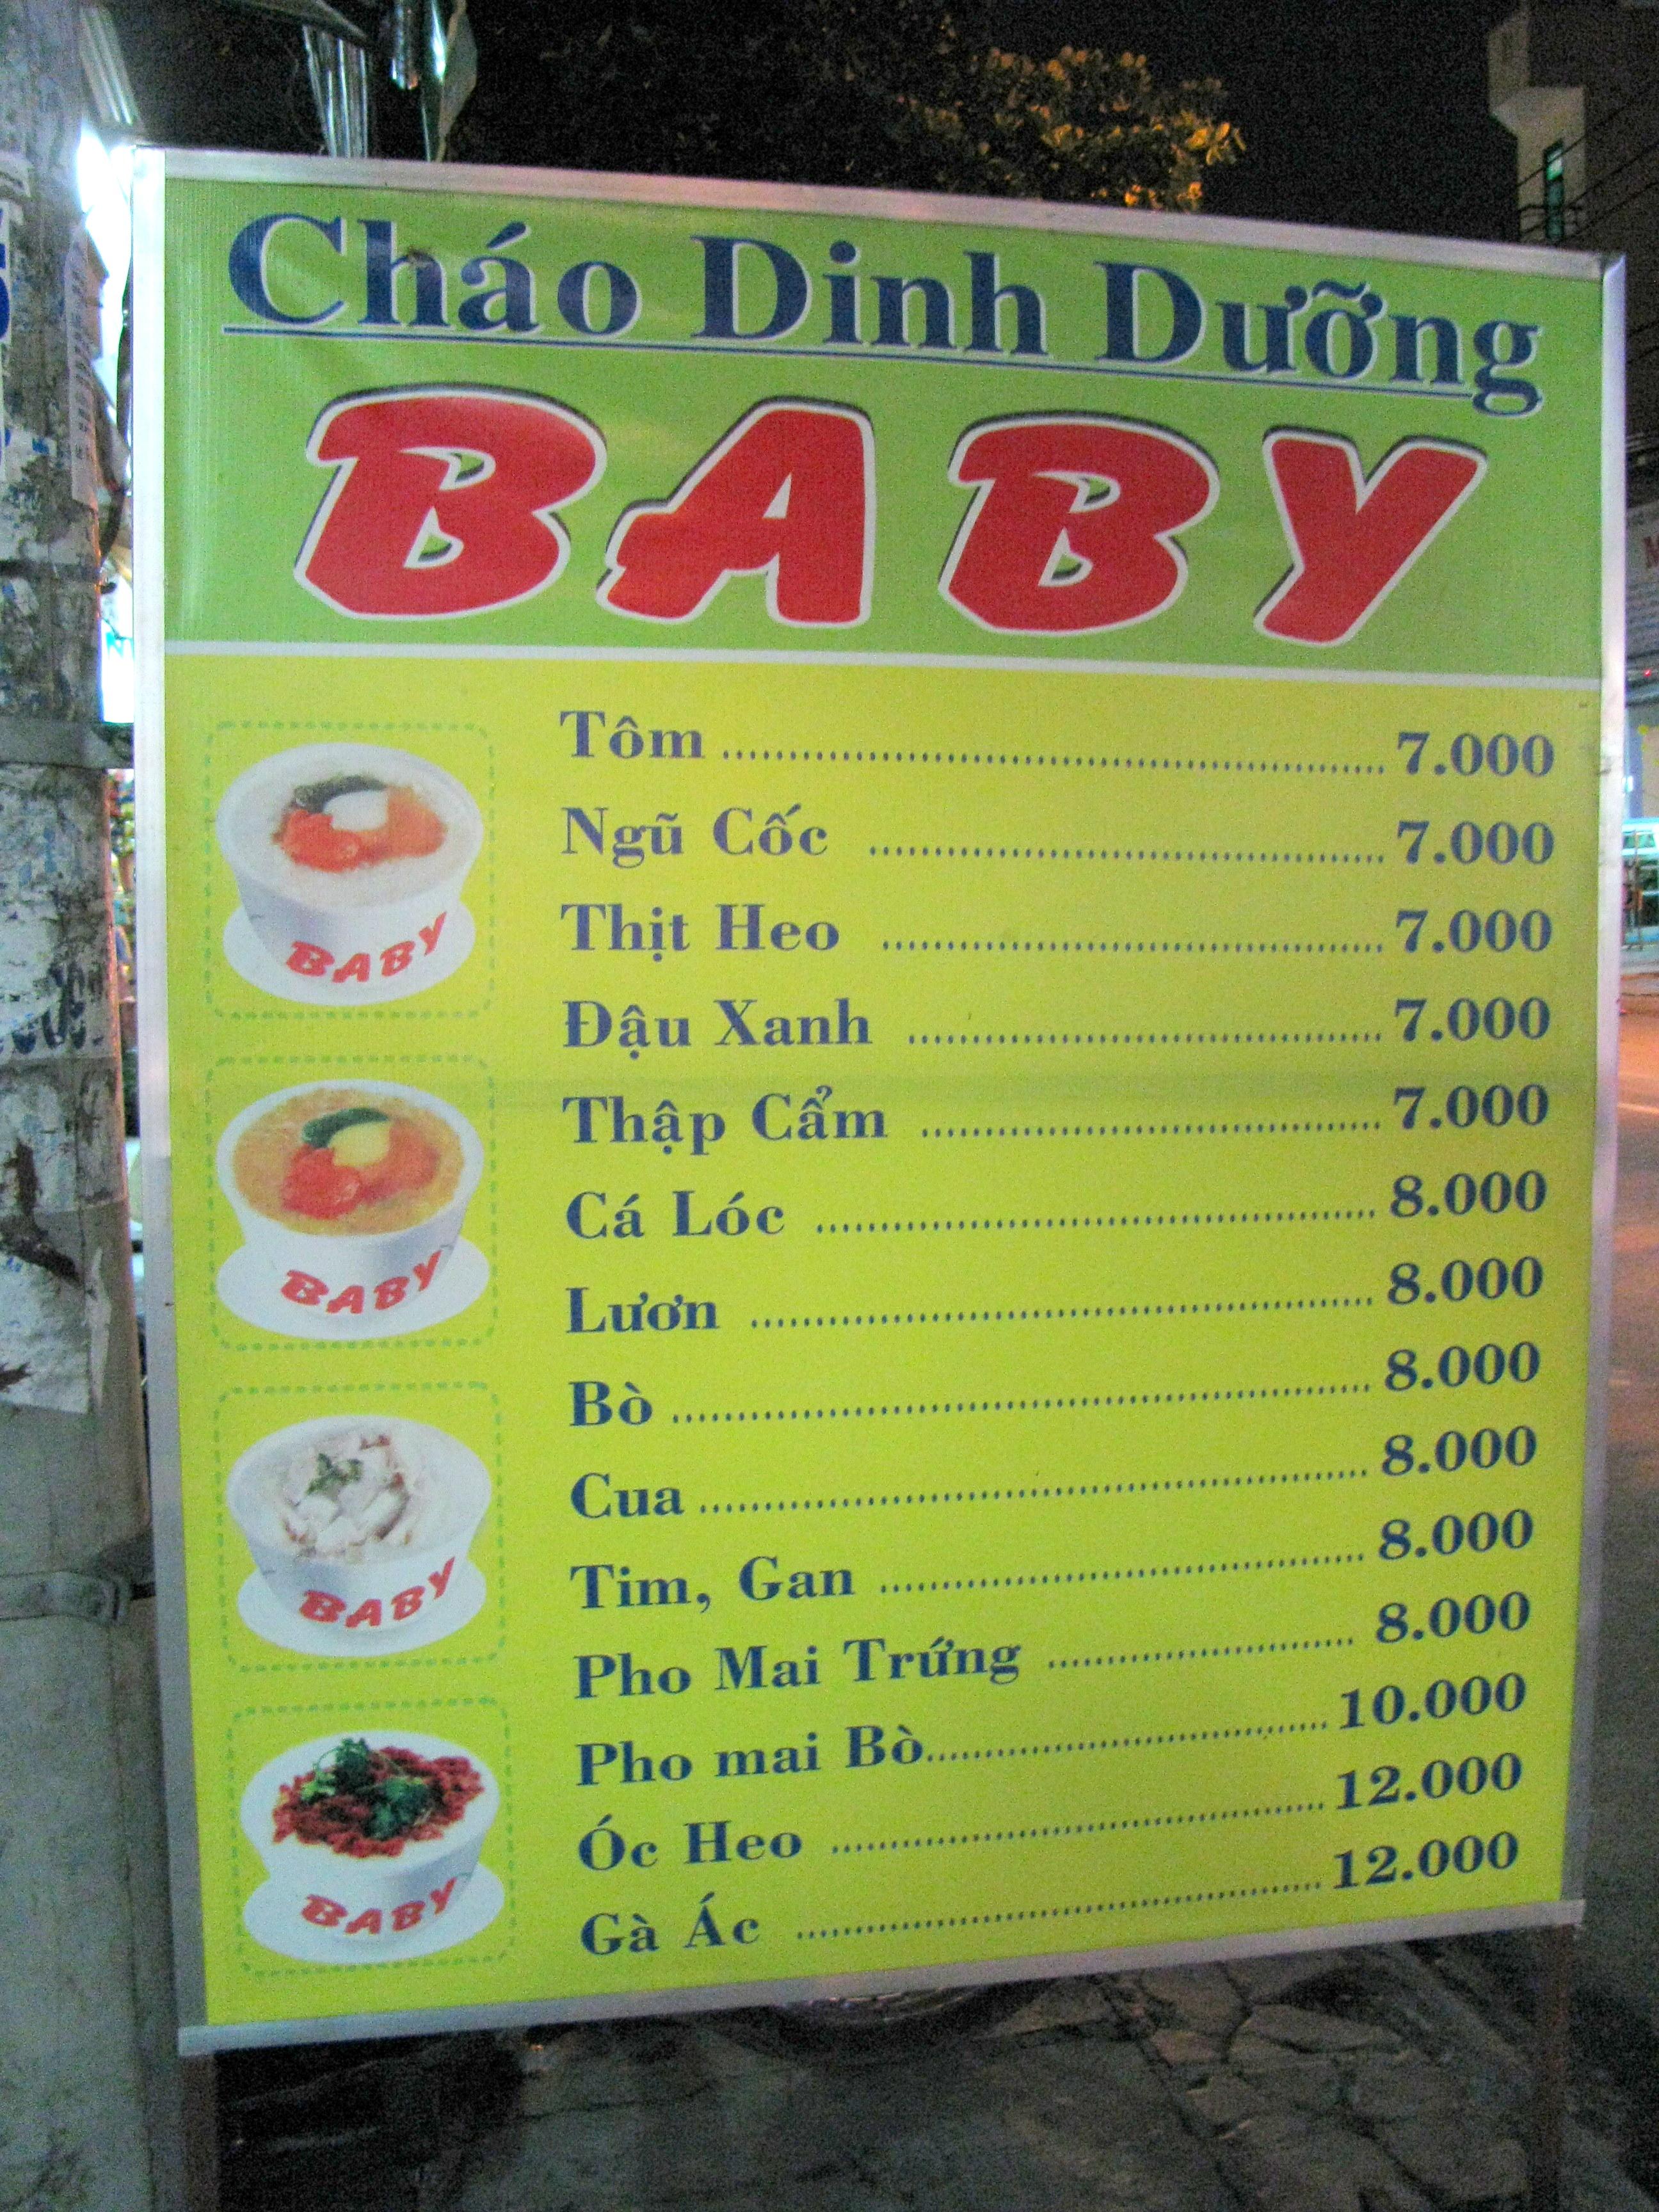 Fat baby soup, anyone?